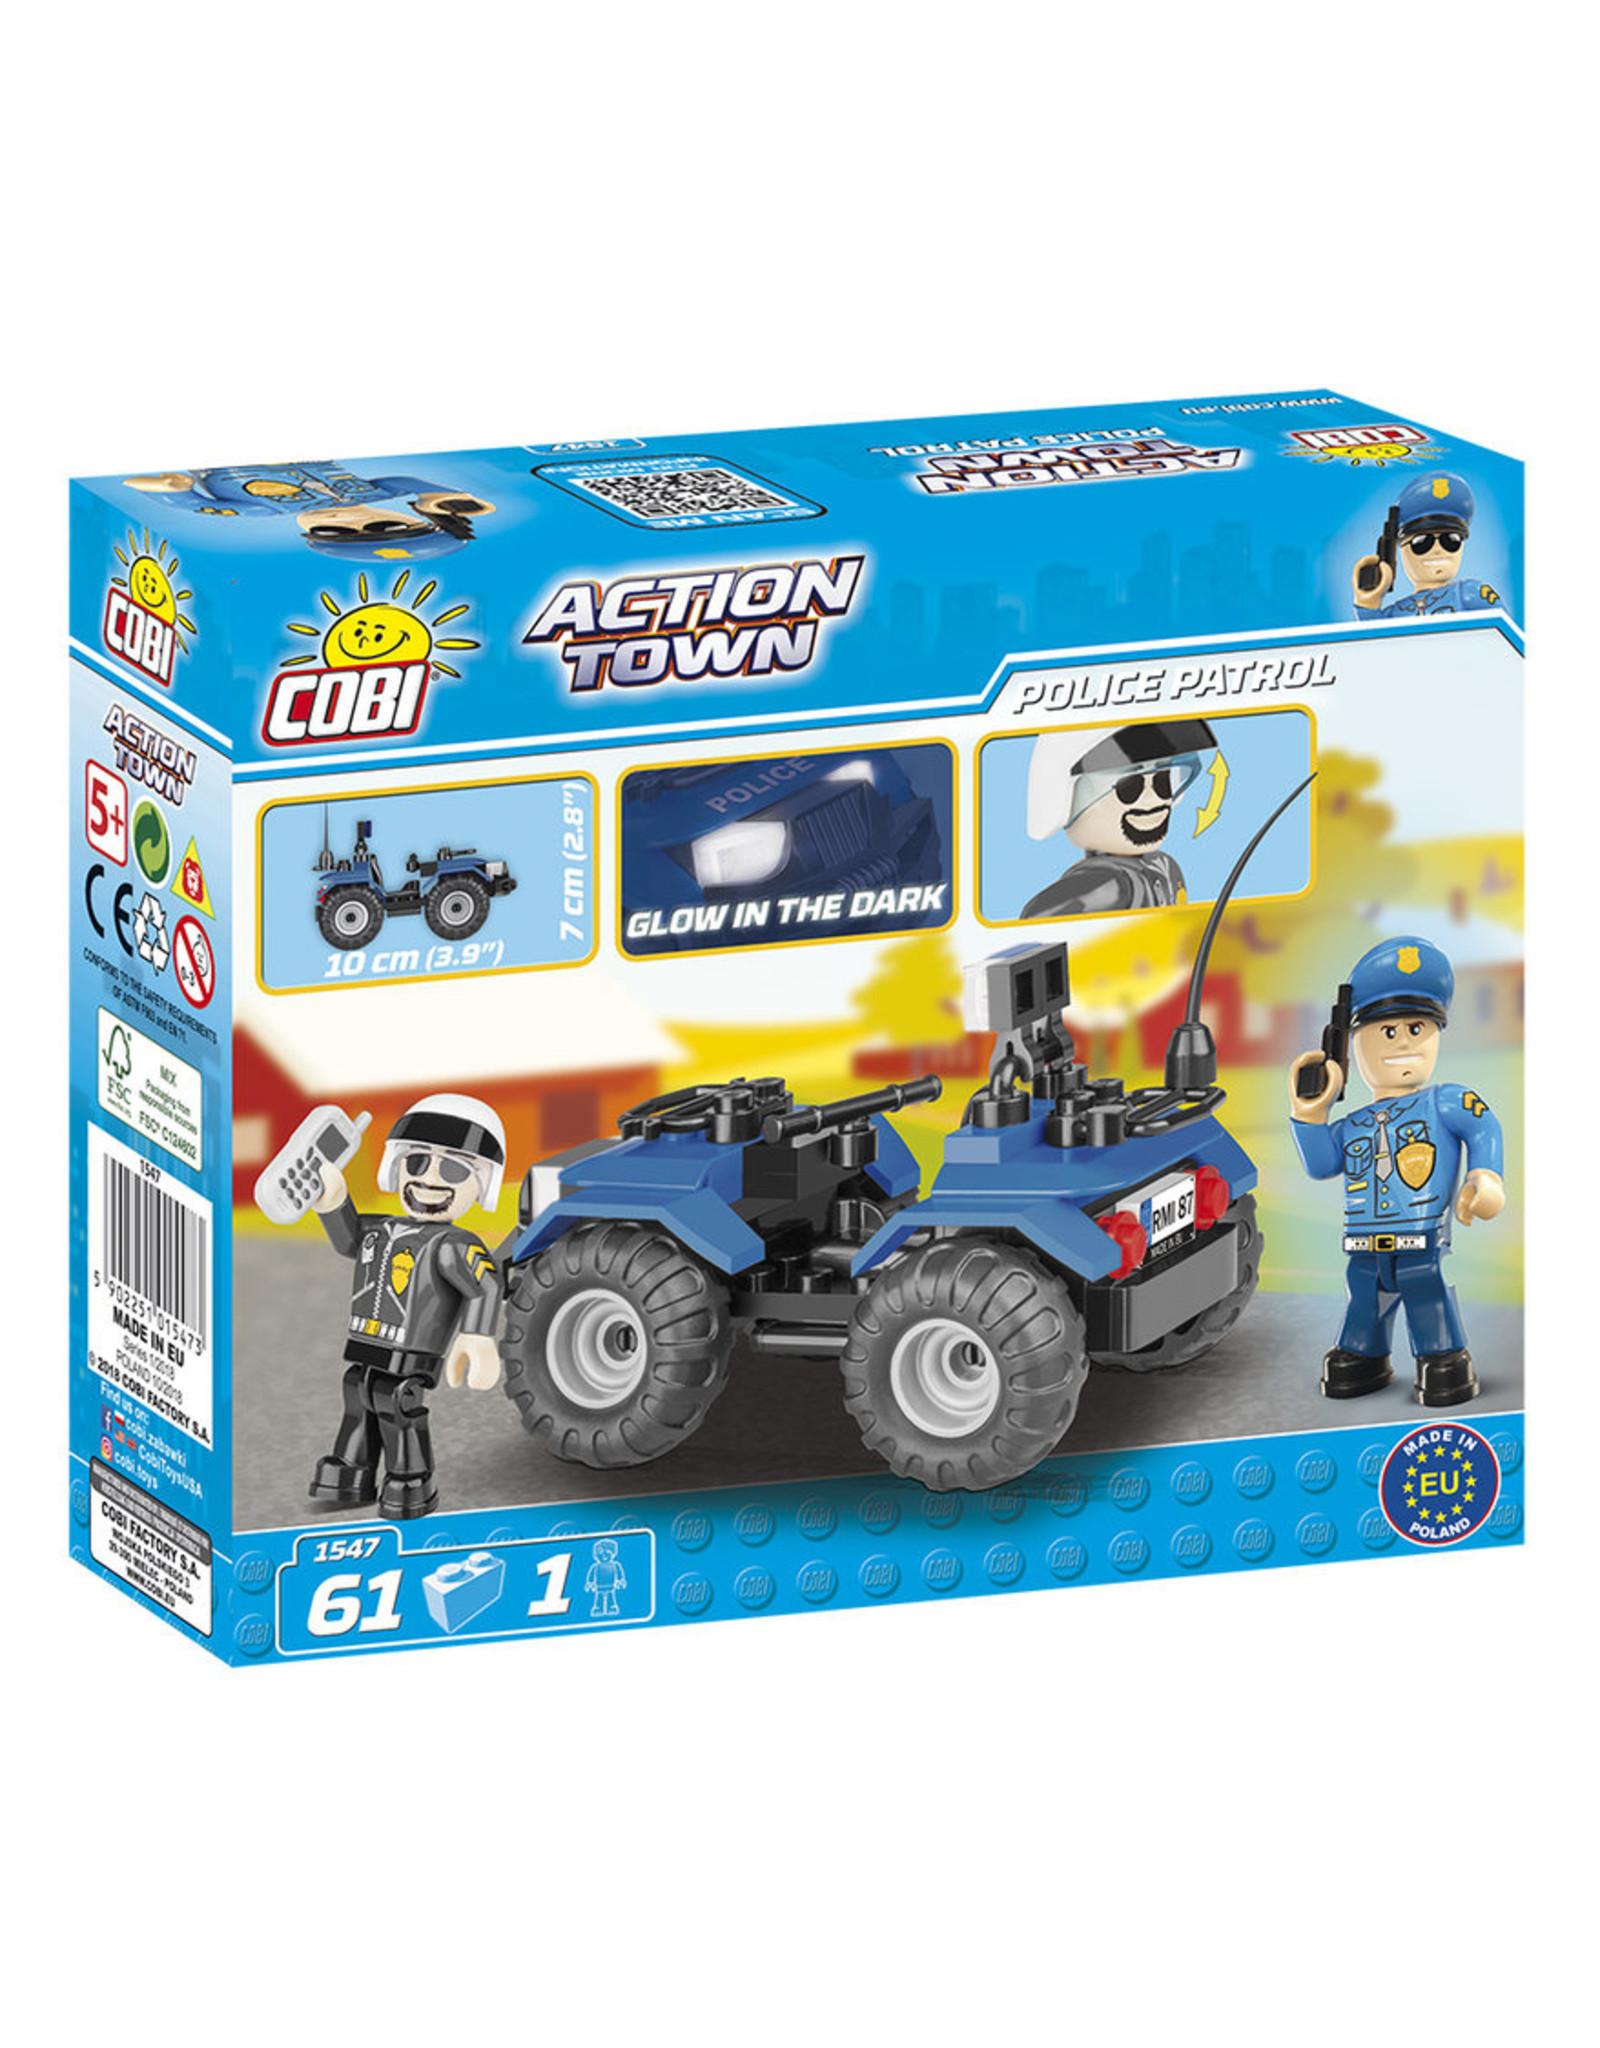 COBI COBI - Action Town 1547 - ATV Police Patrol